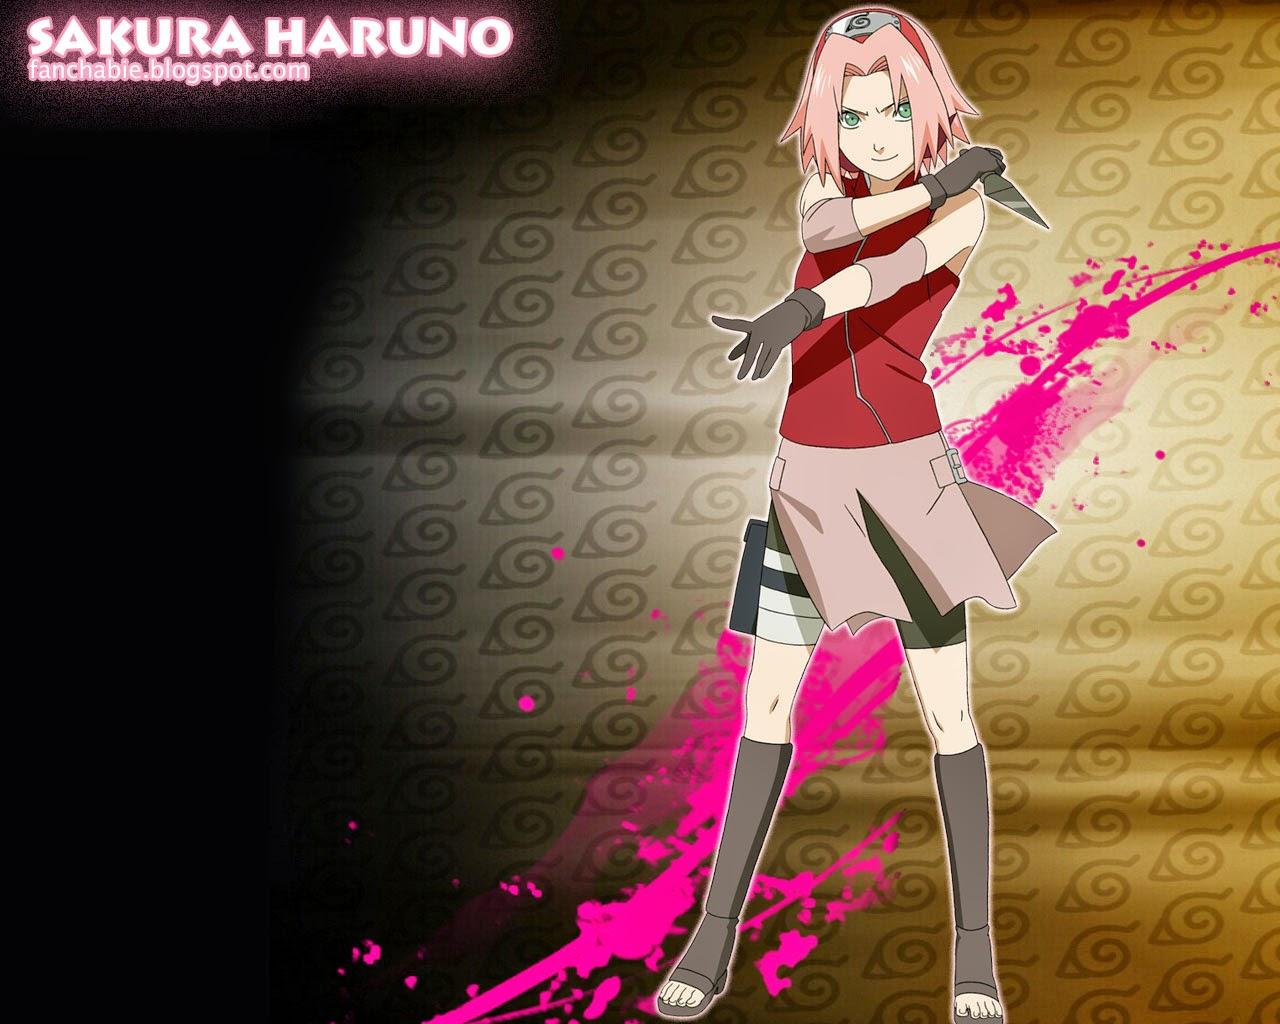 Nice wallpaper from Sakura Haruno